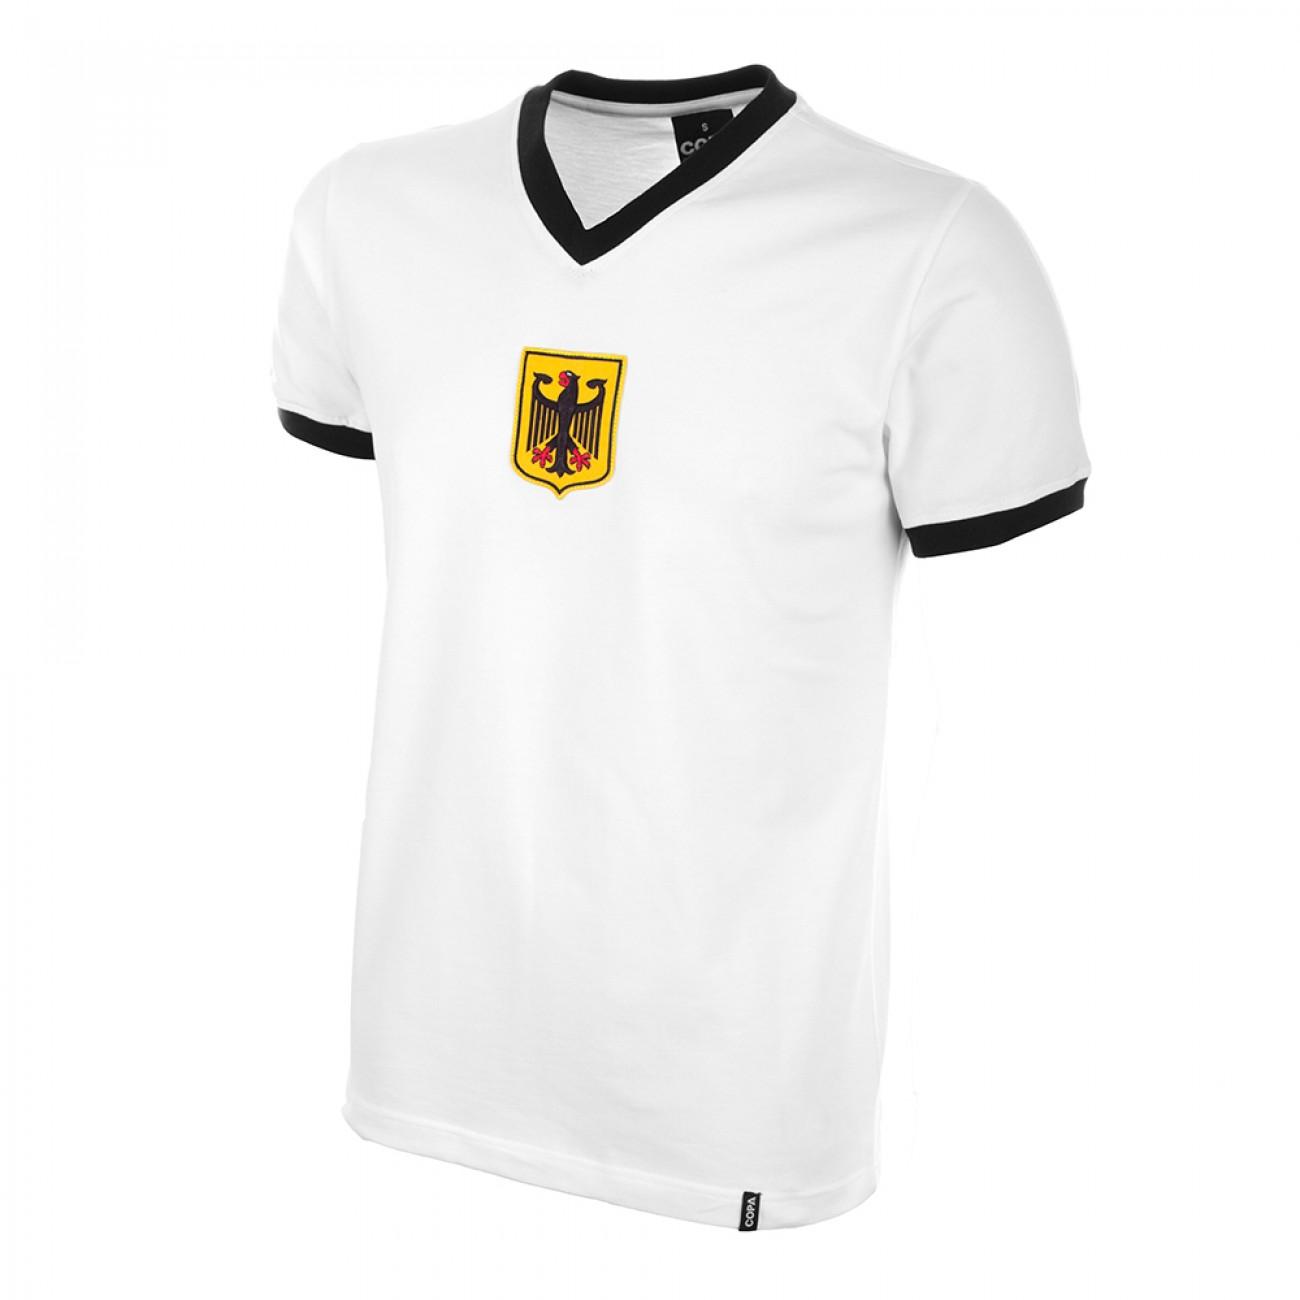 Camiseta Alemania años 70. Selección Alemana.   Retrofootball®